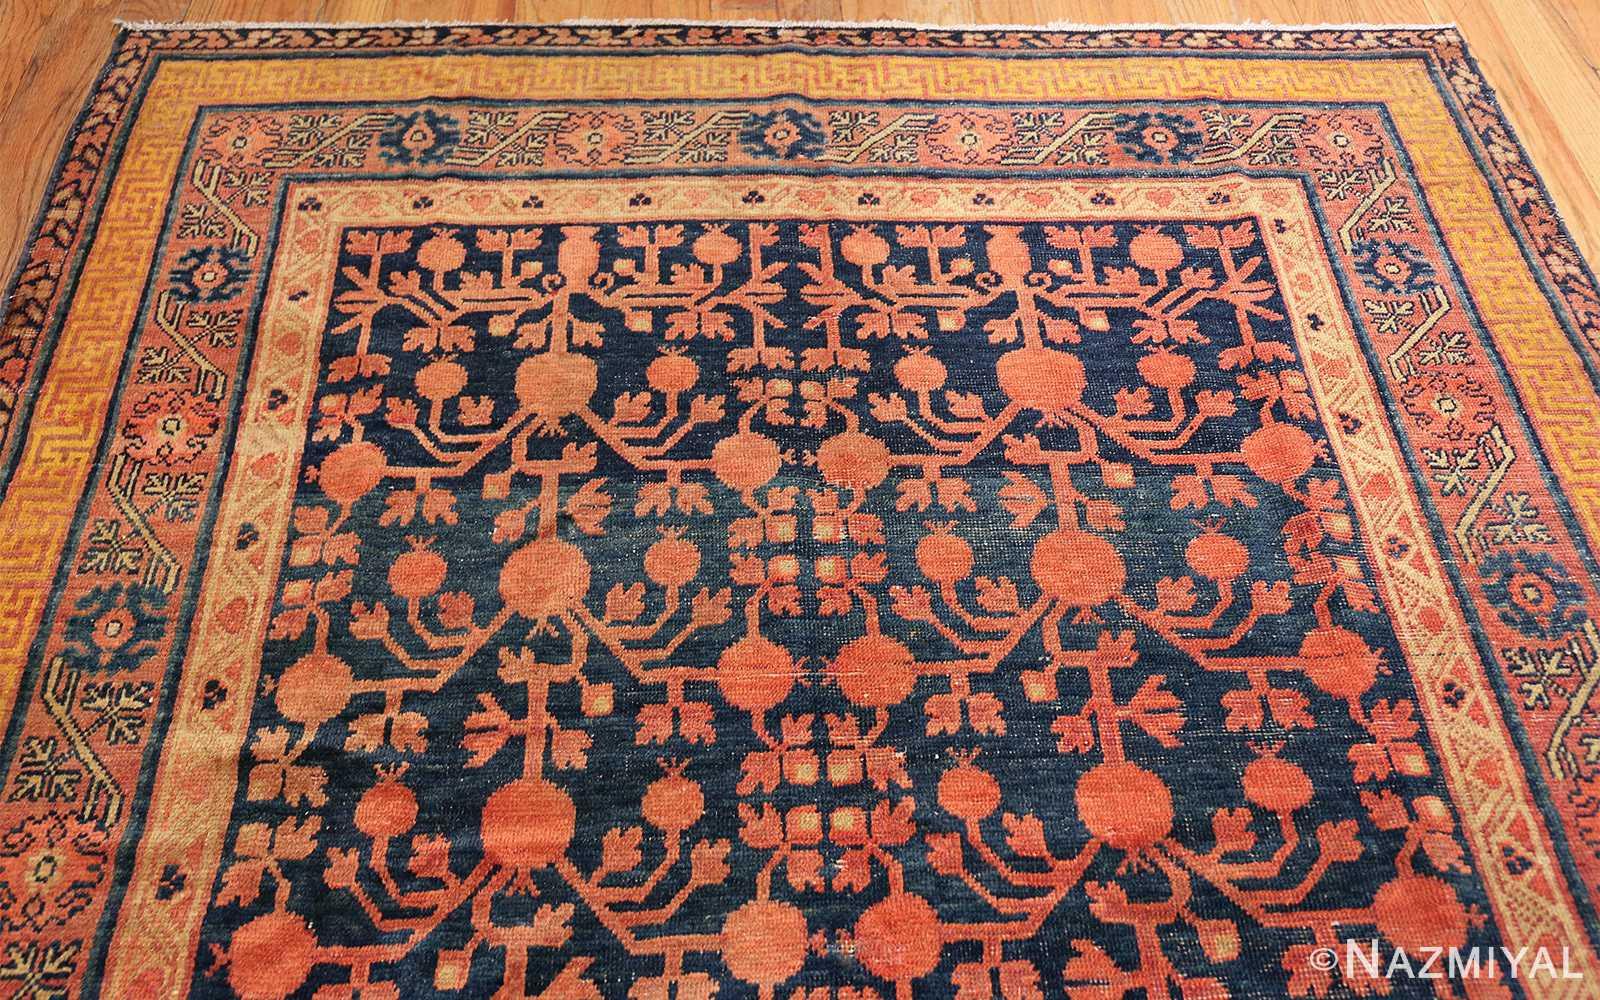 antique navy background pomegranate design khotan rug 49483 top Nazmiyal